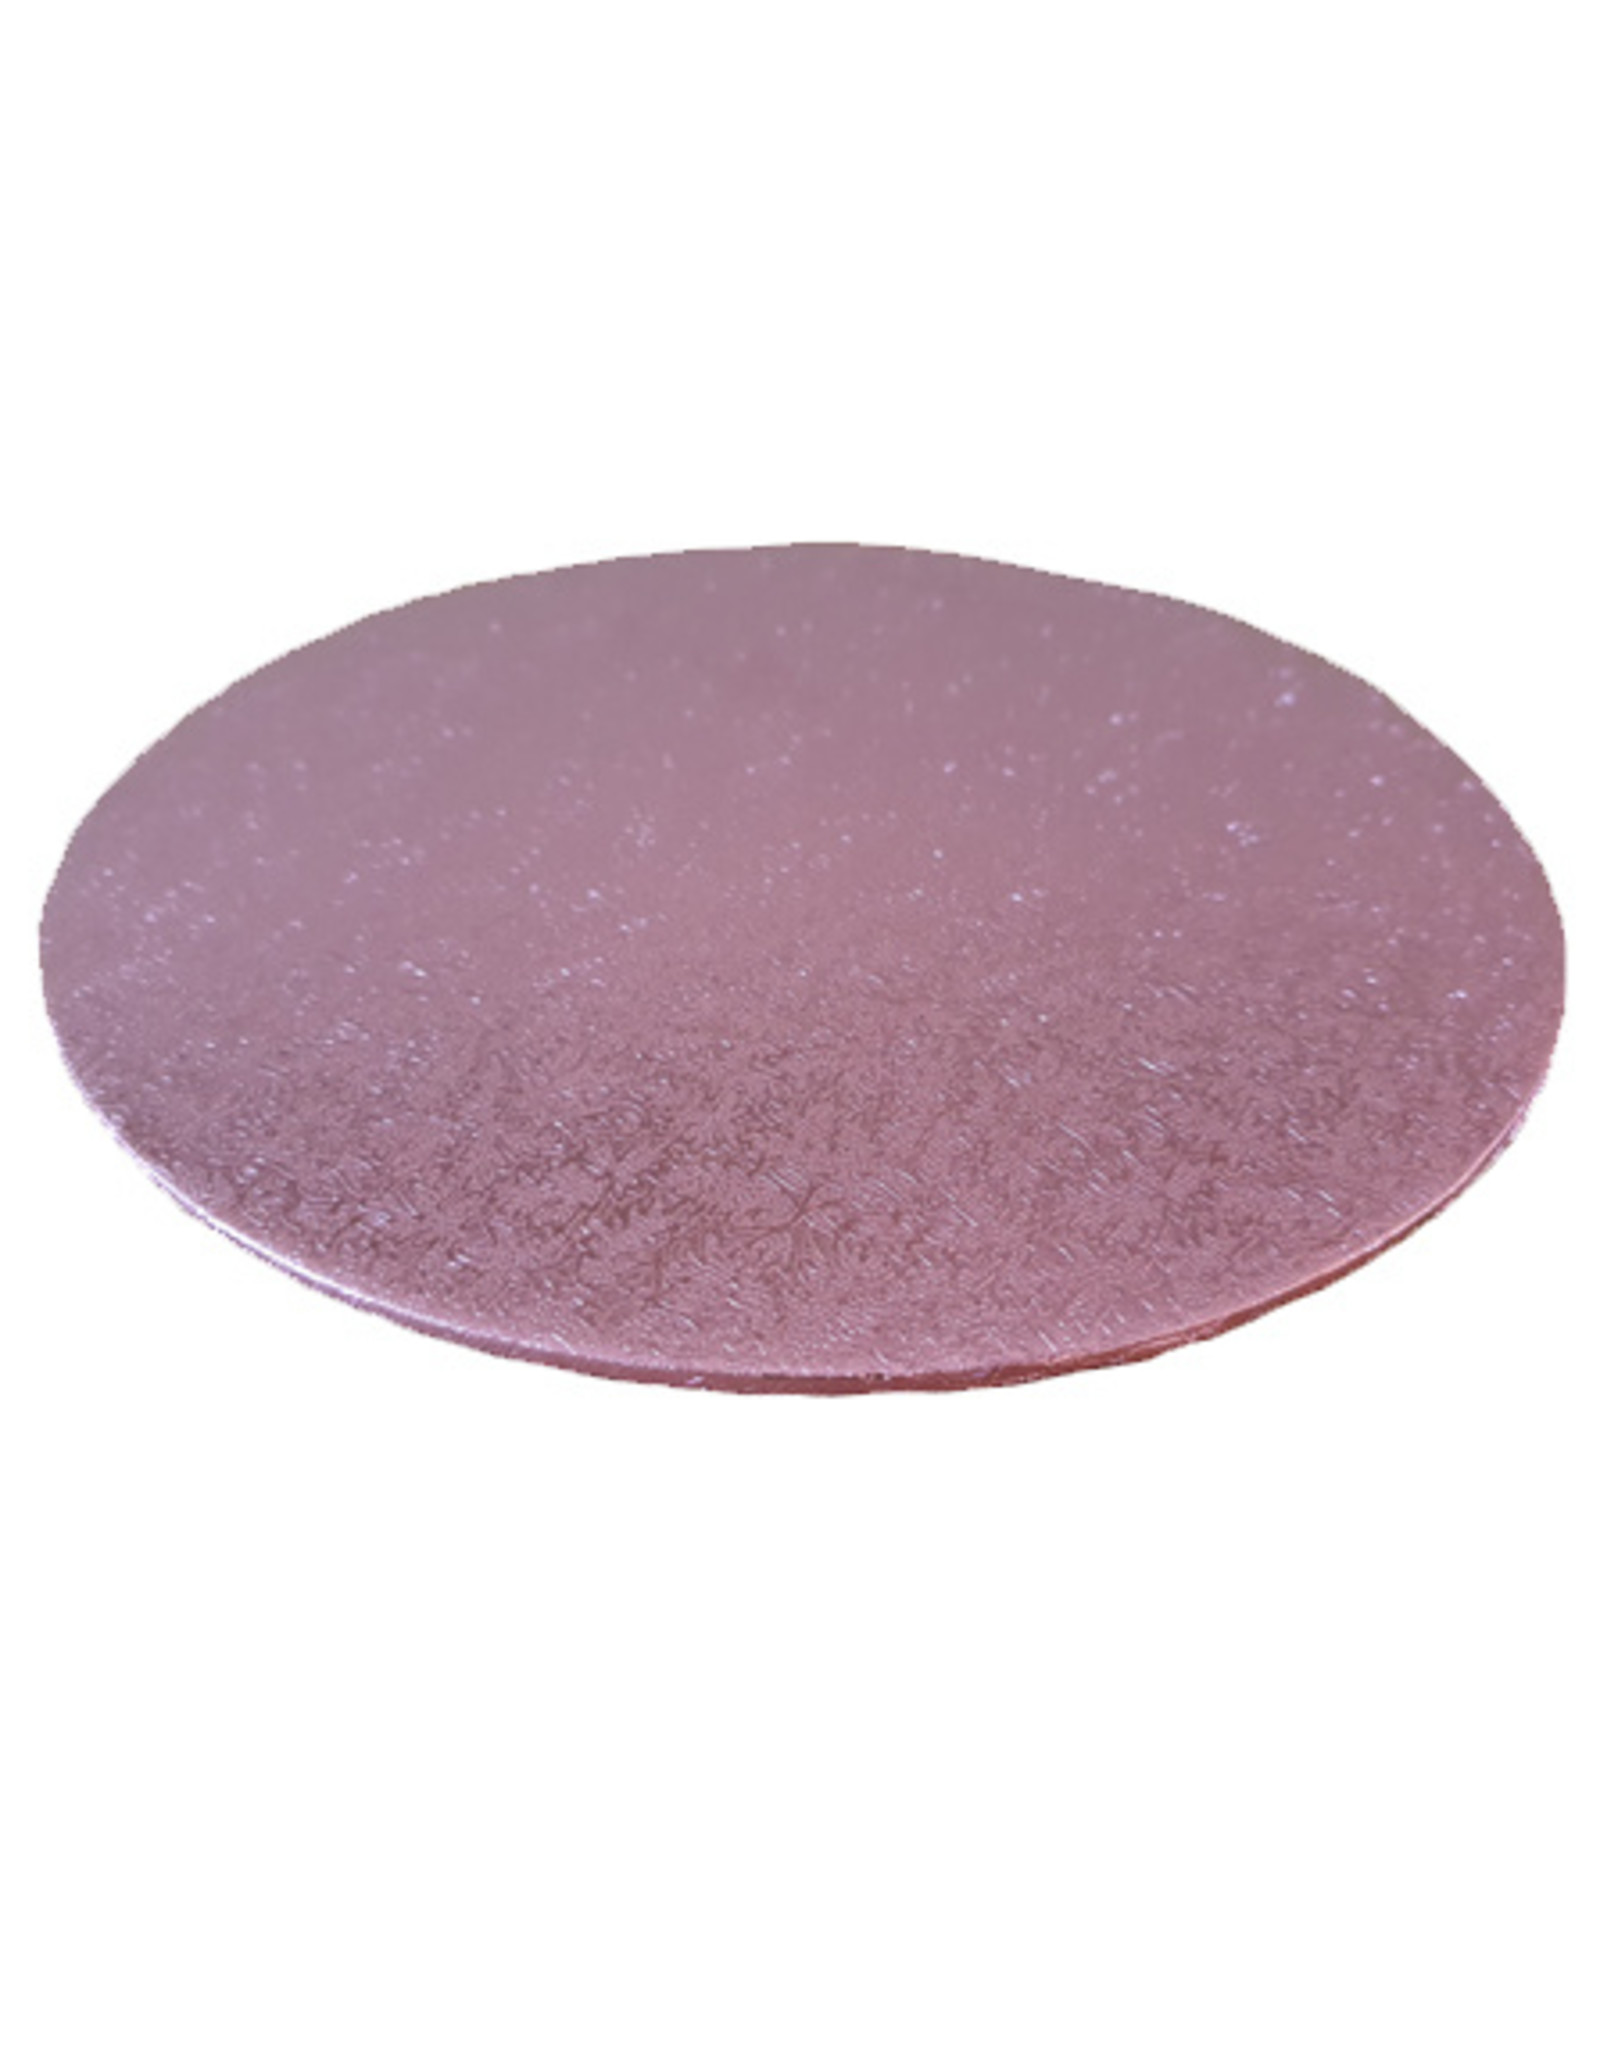 Cakeboards Ø203 mm - pink (per 10 pieces)